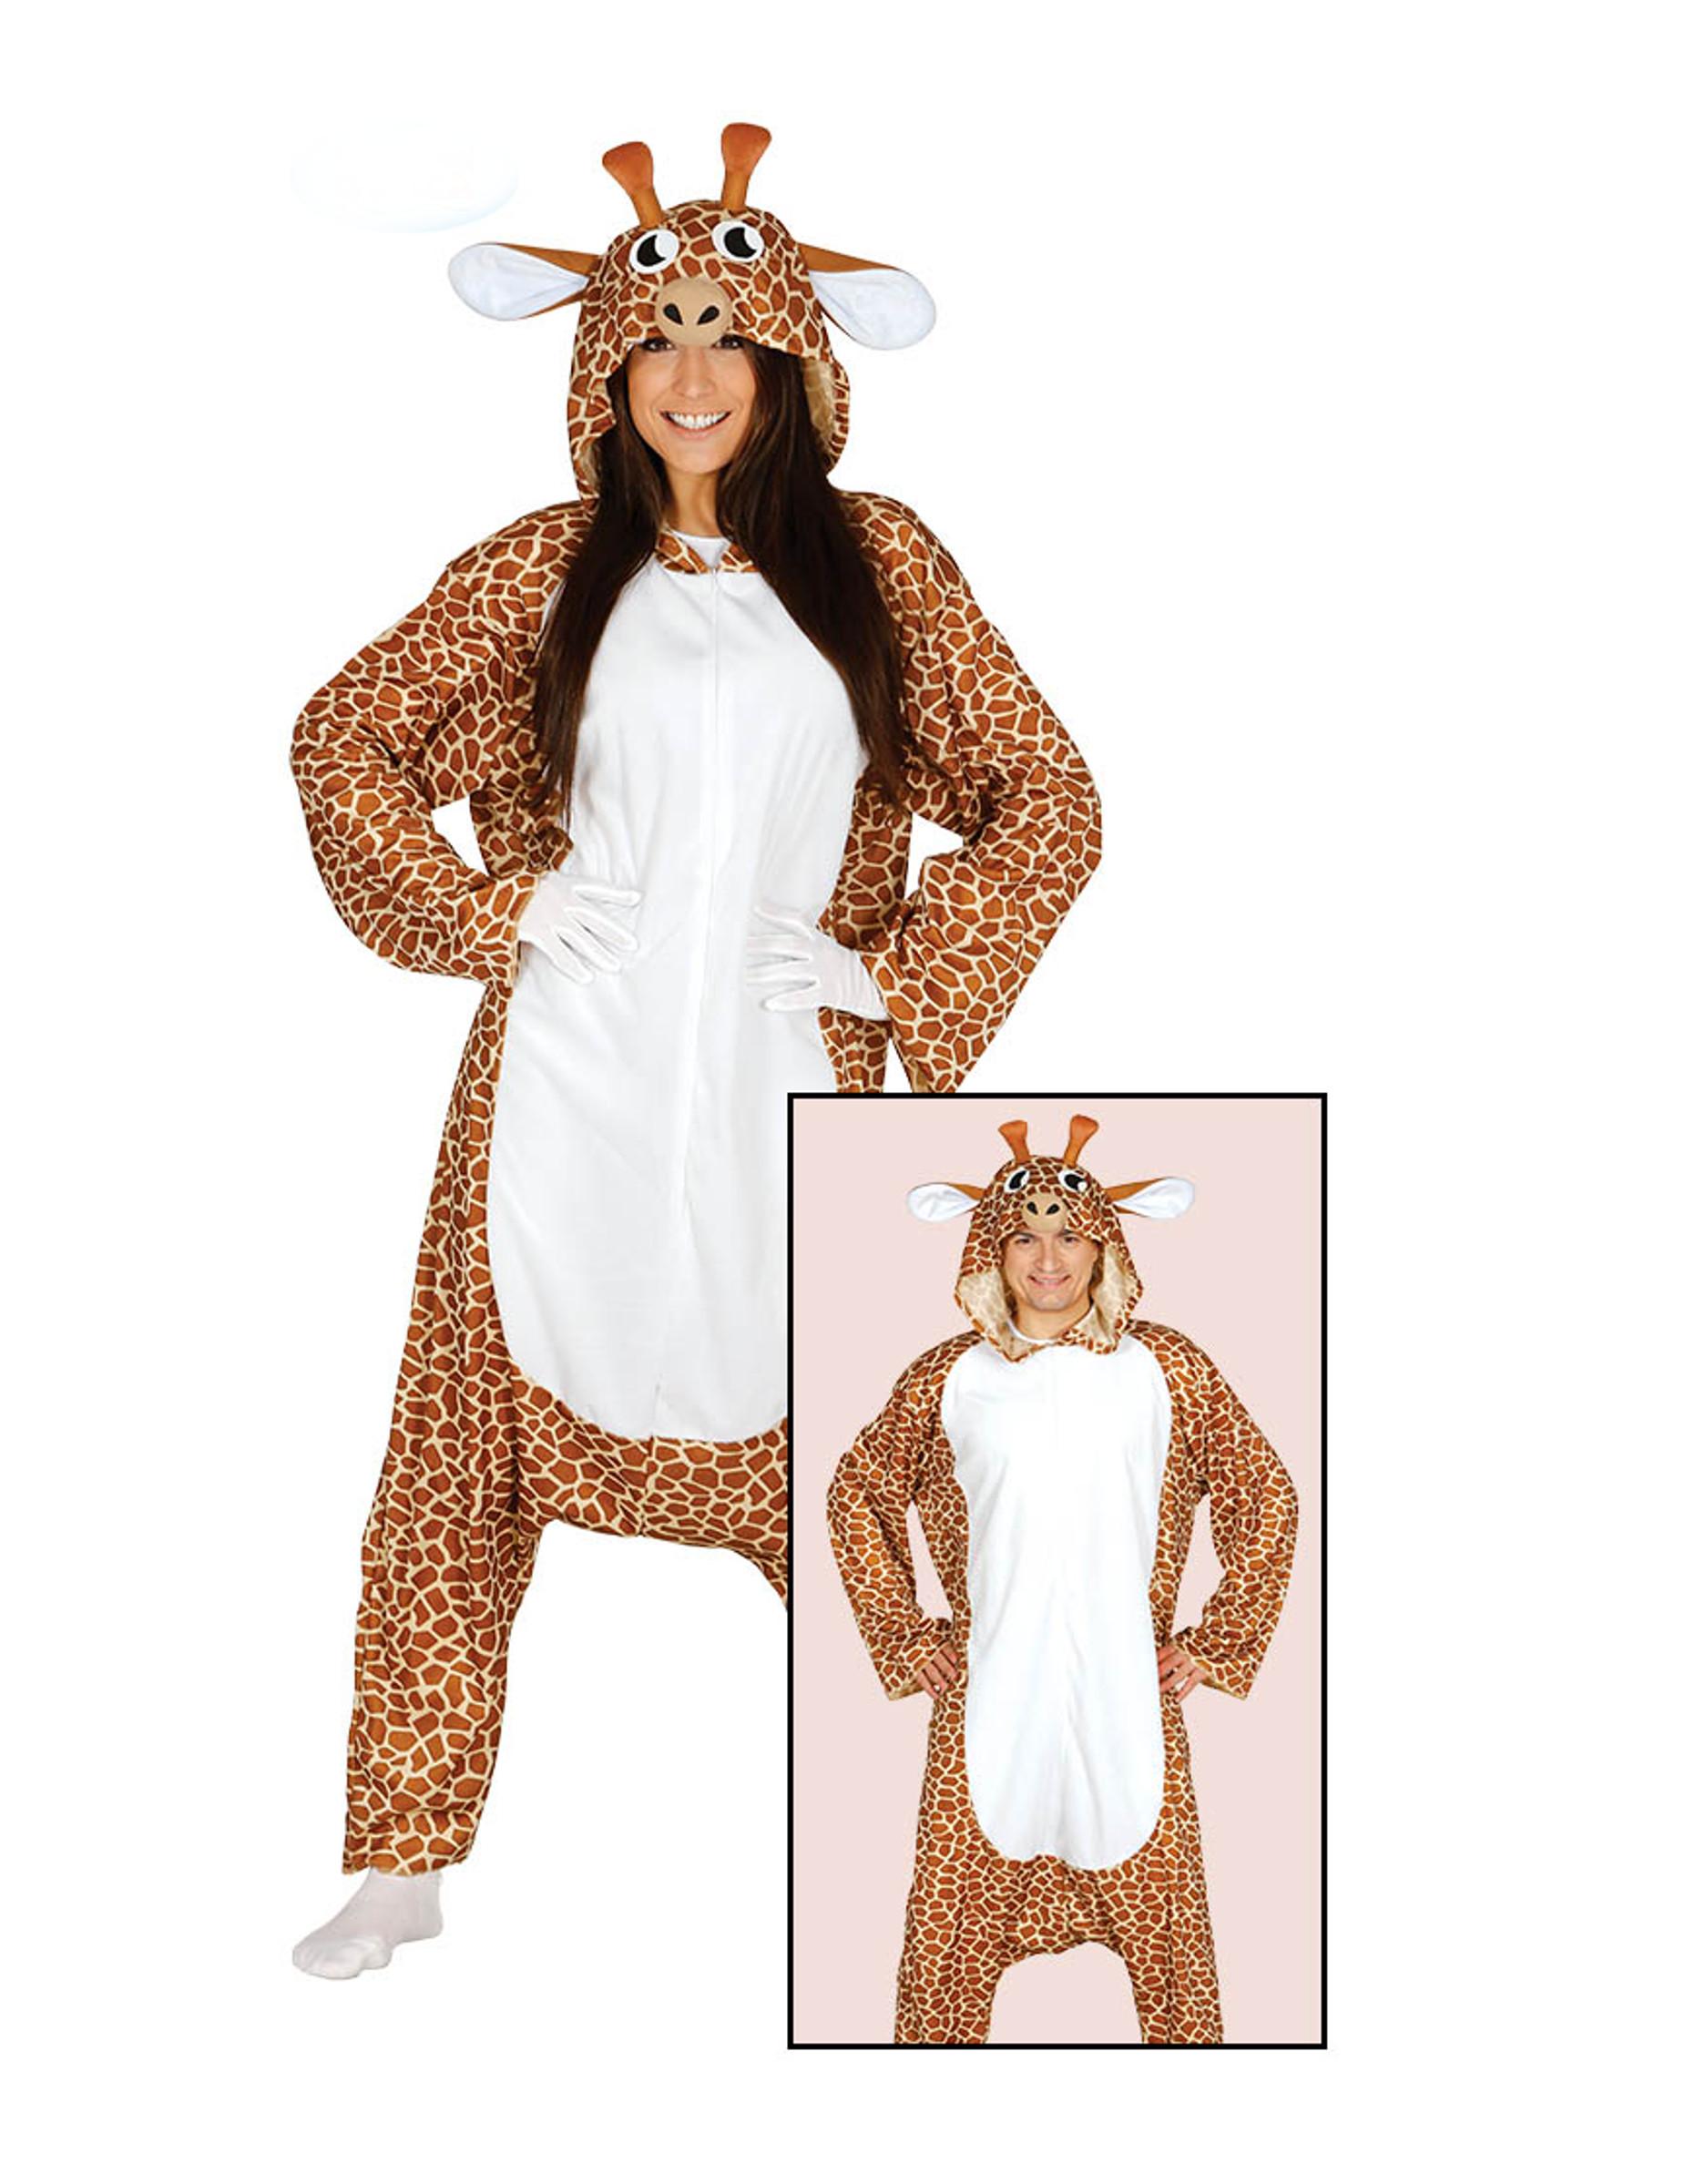 Déguisement combinaison girafe adulte